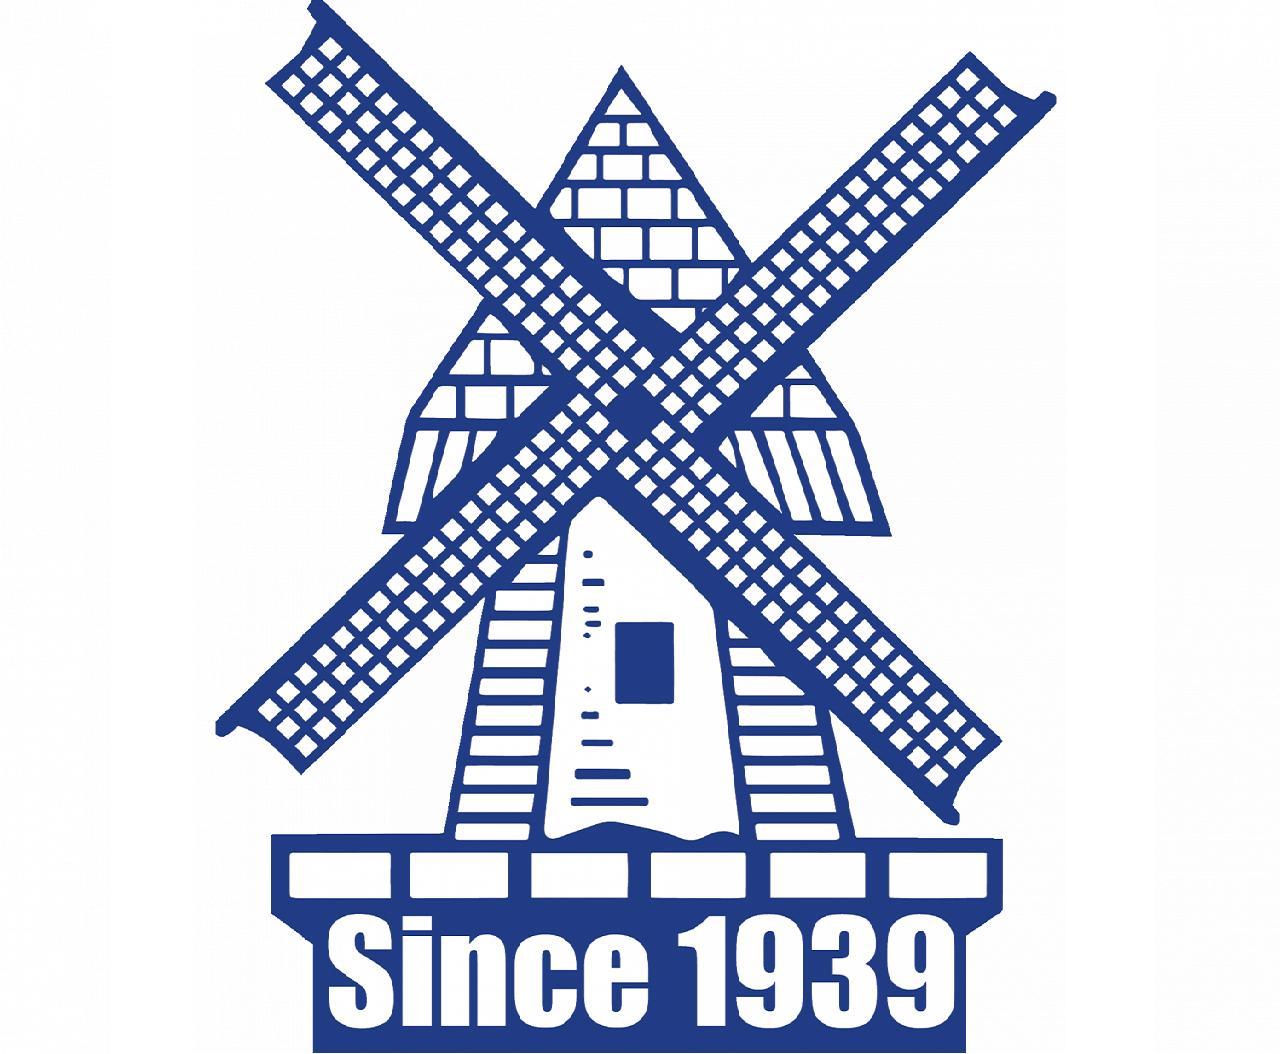 1846154c95 international dt466e price 250 00 [ 1280 x 960 Pixel ]